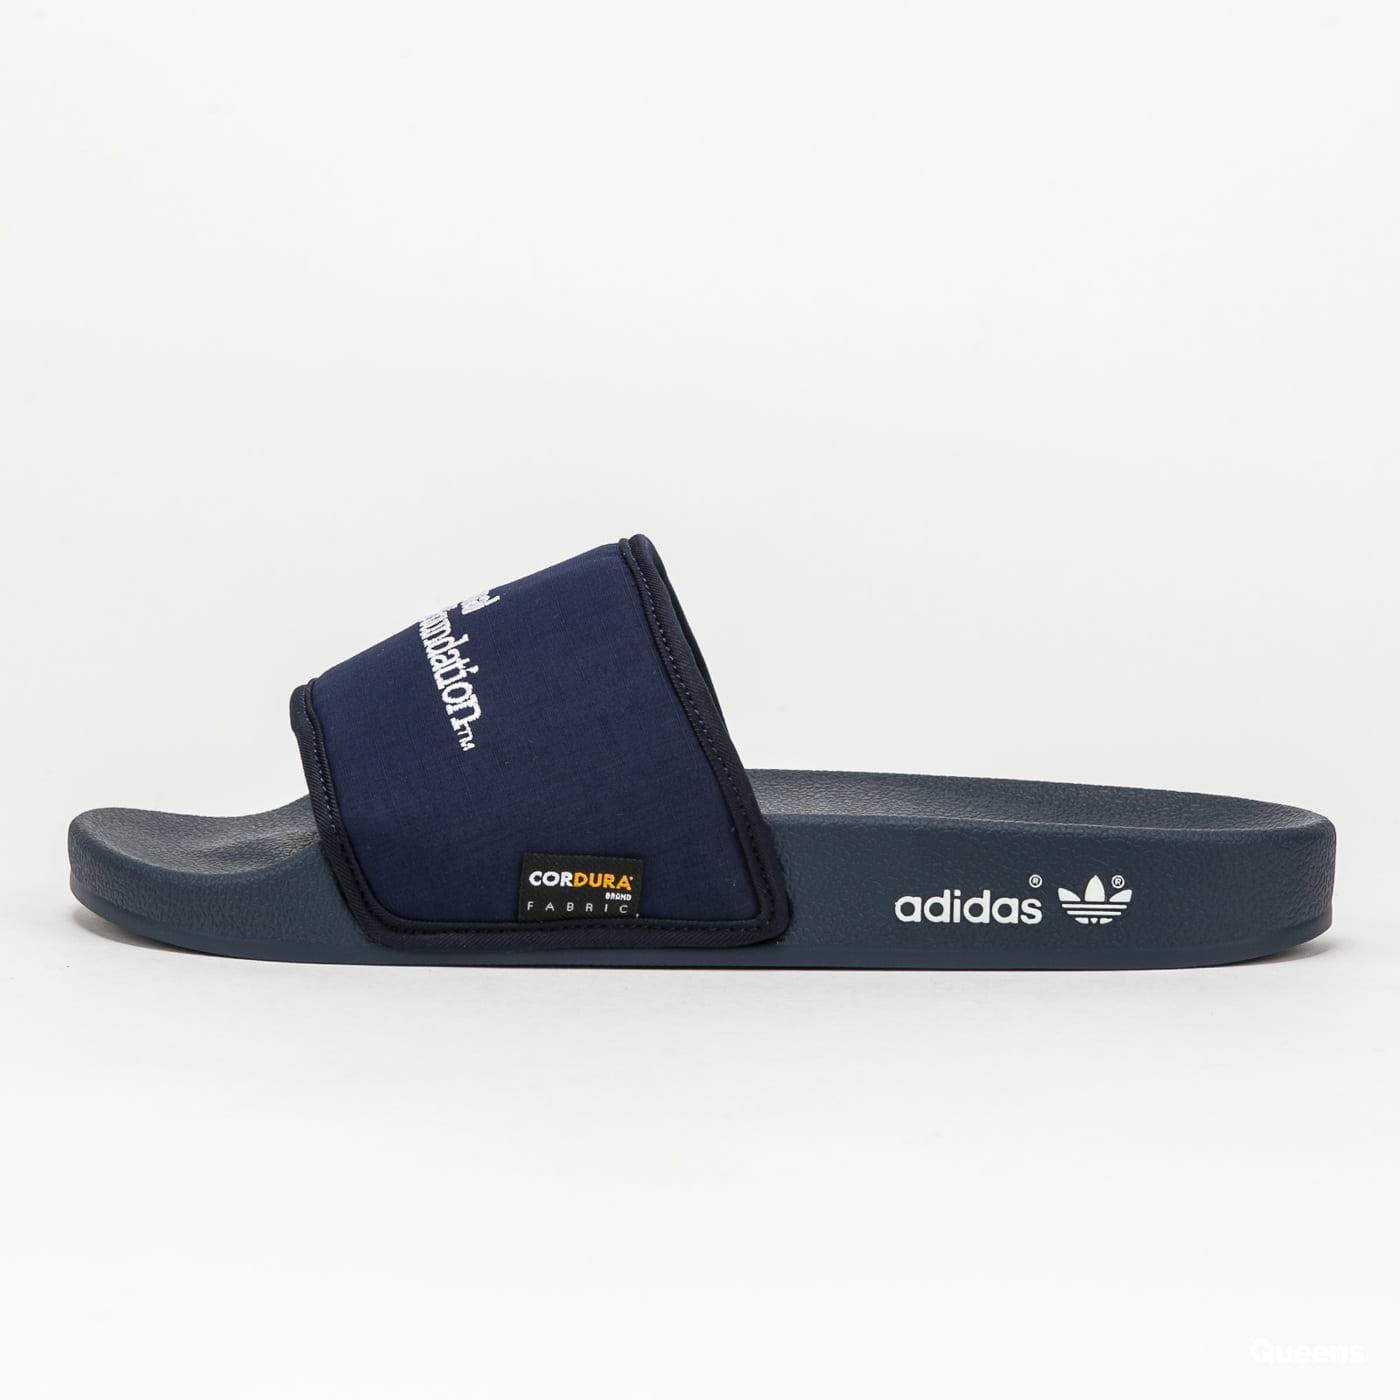 adidas Originals Adilette conavy / ftwwht / conavy